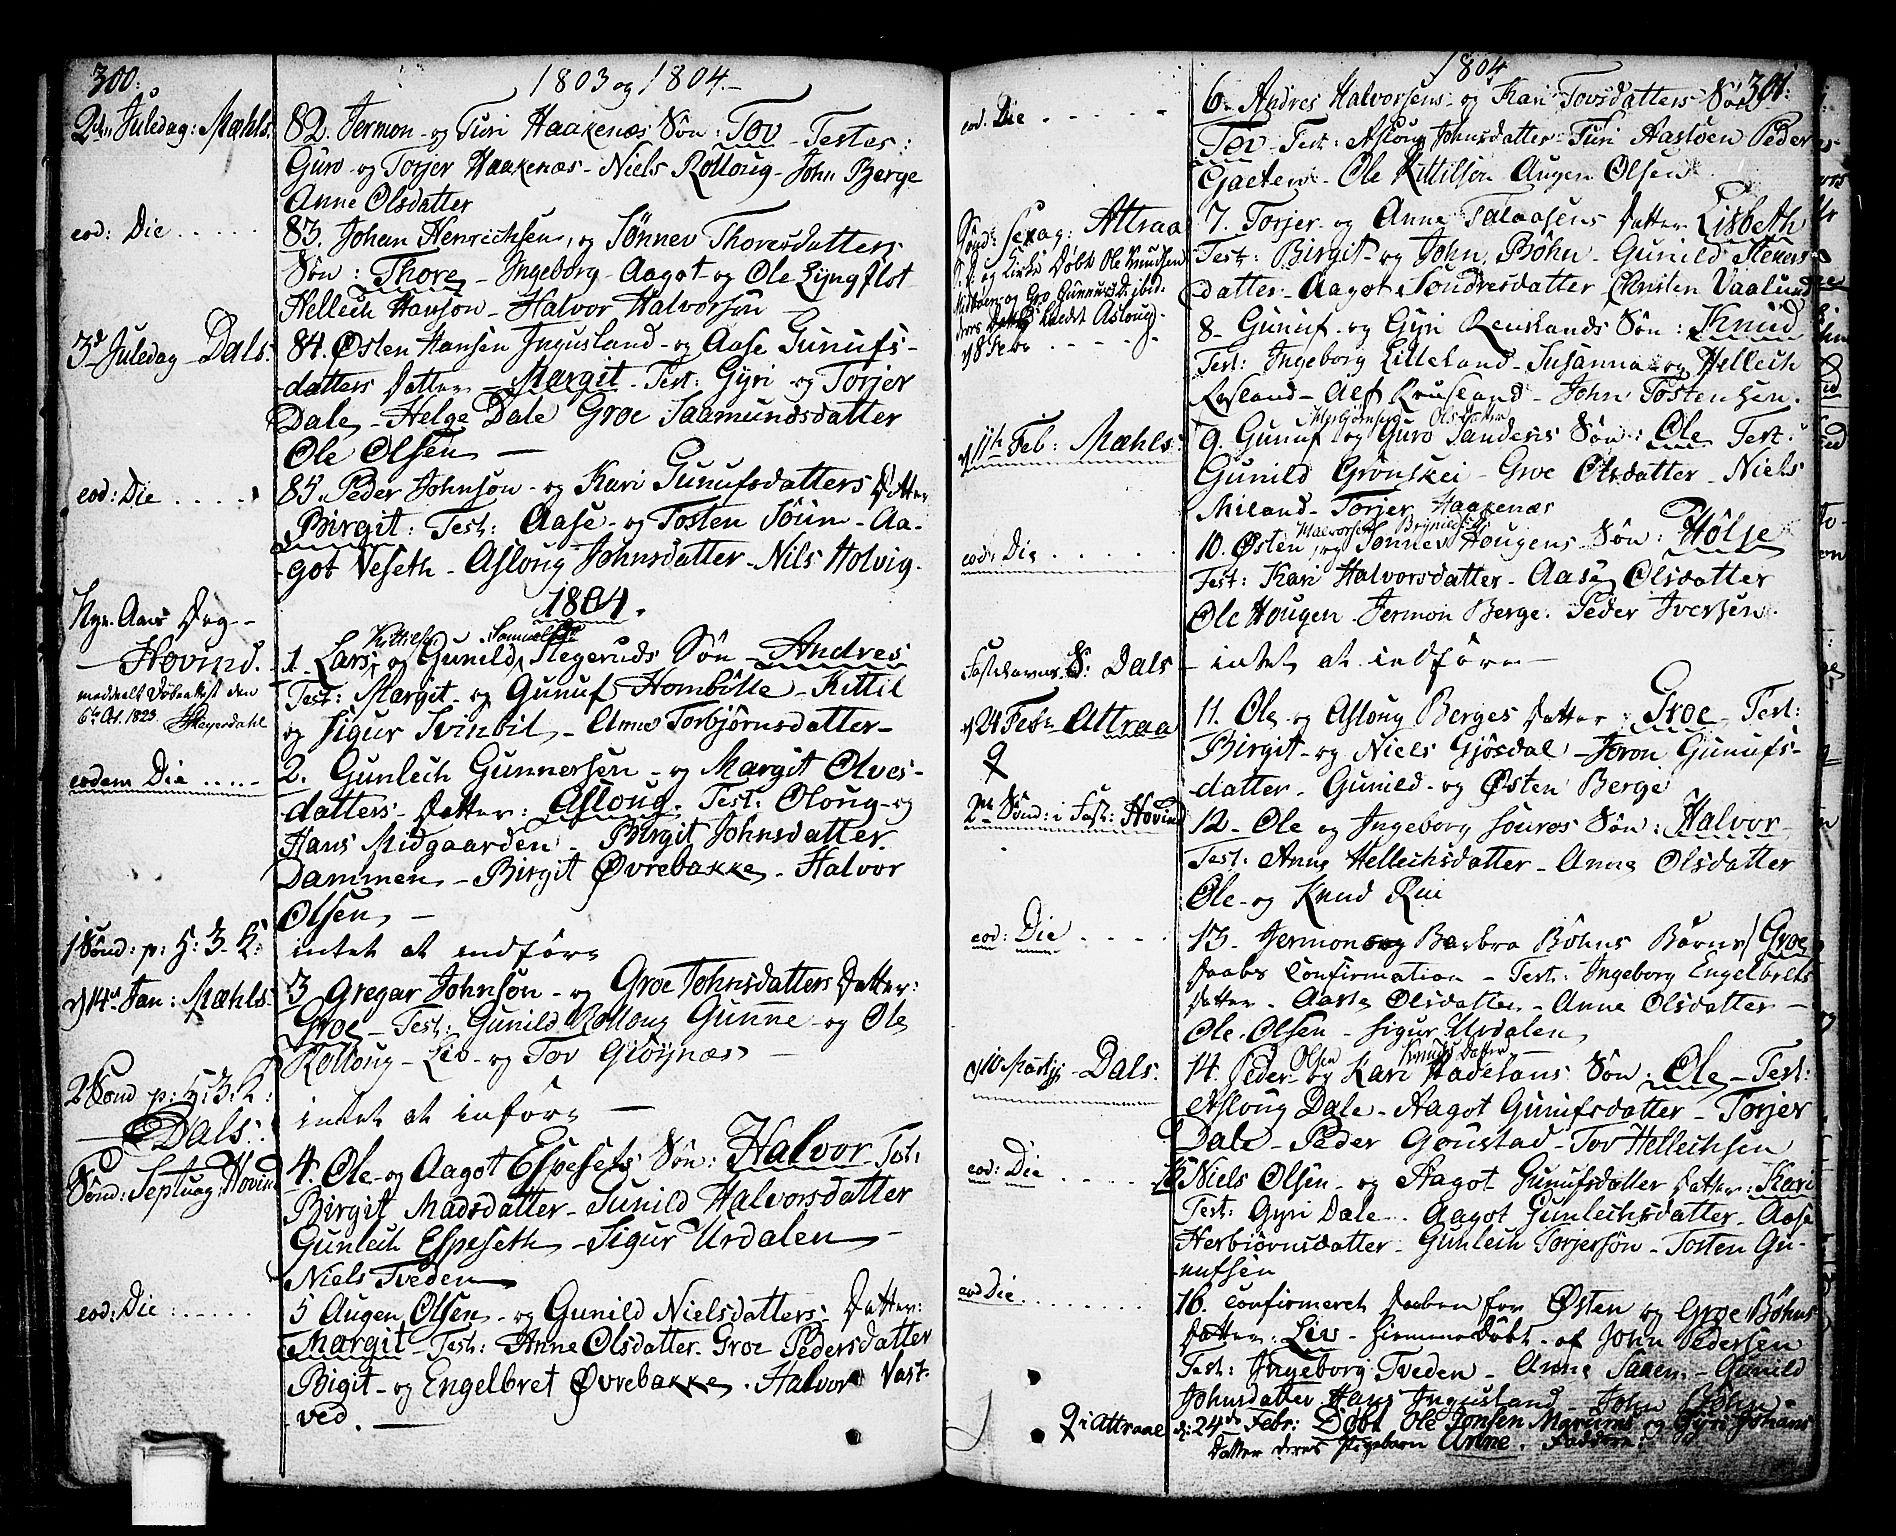 SAKO, Tinn kirkebøker, F/Fa/L0002: Ministerialbok nr. I 2, 1757-1810, s. 300-301